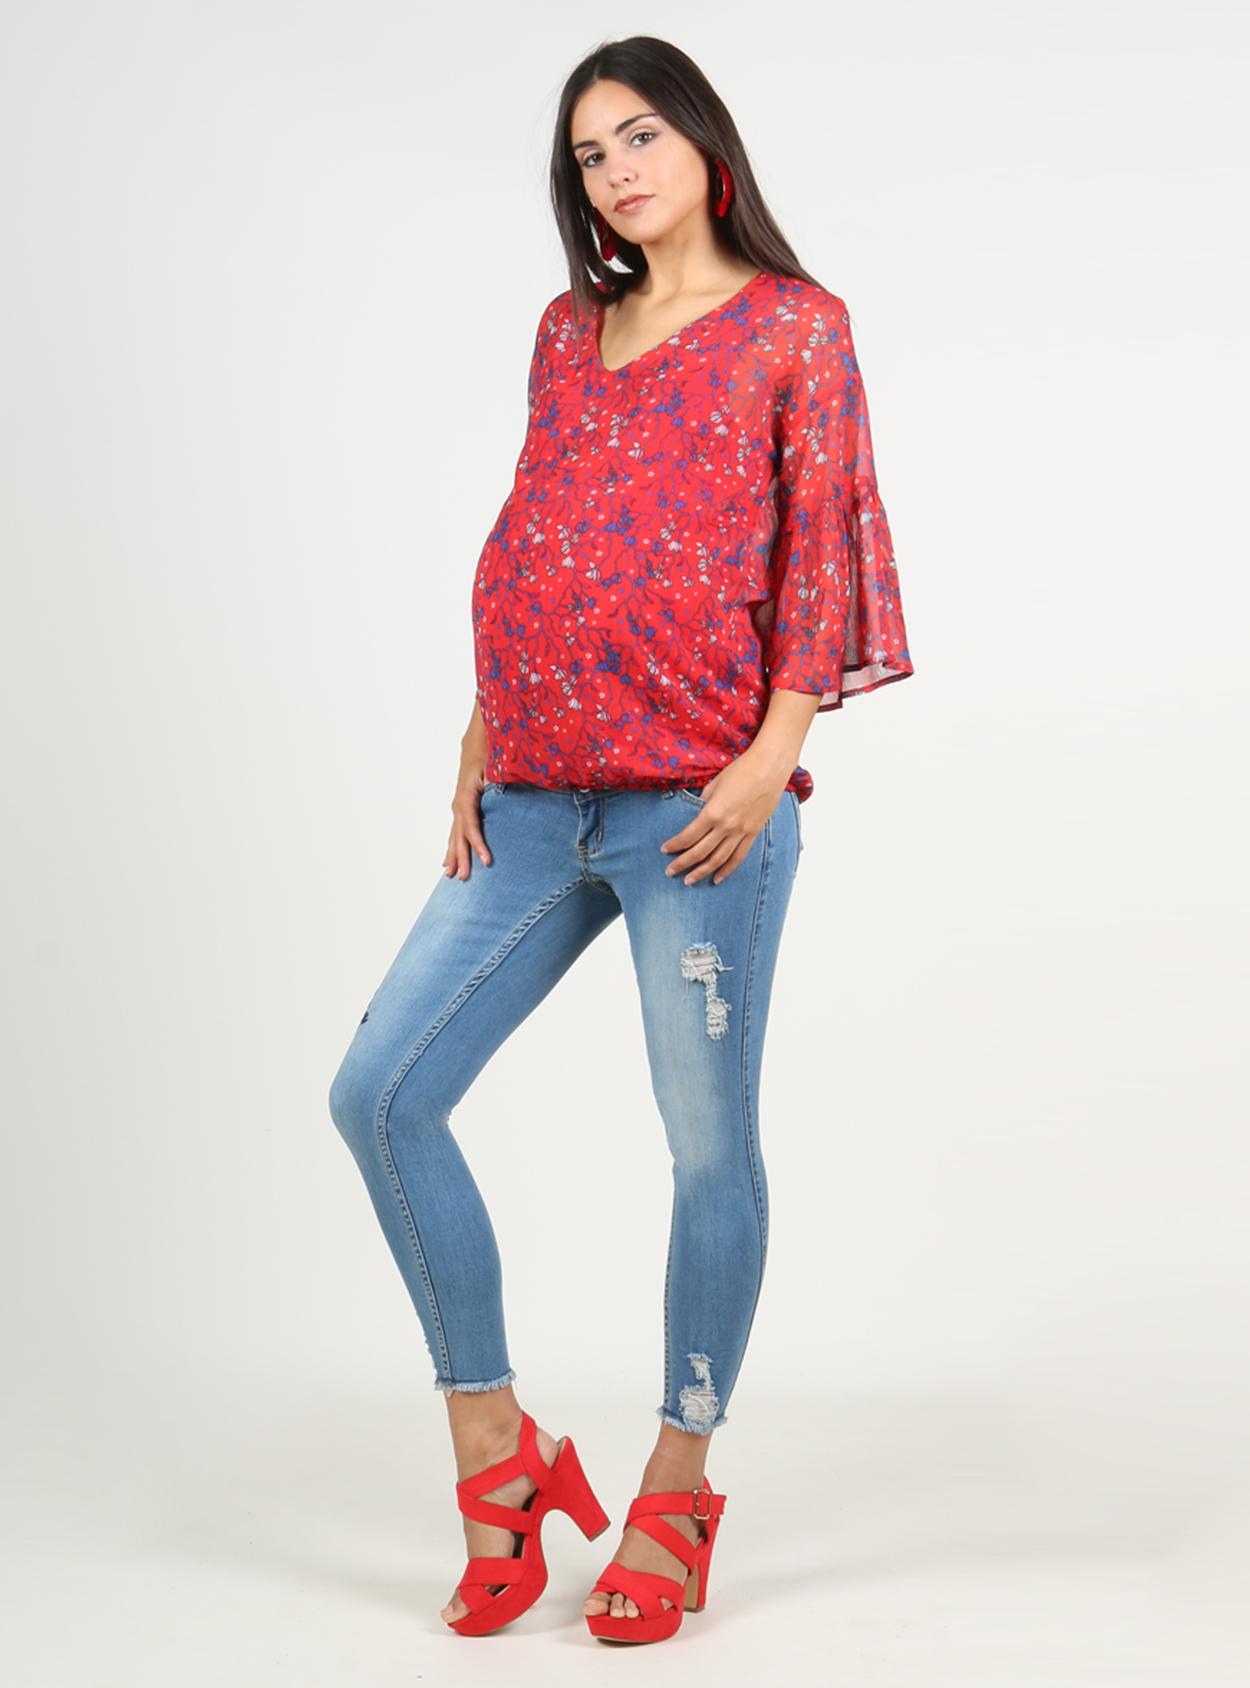 Blusa estampada georgette